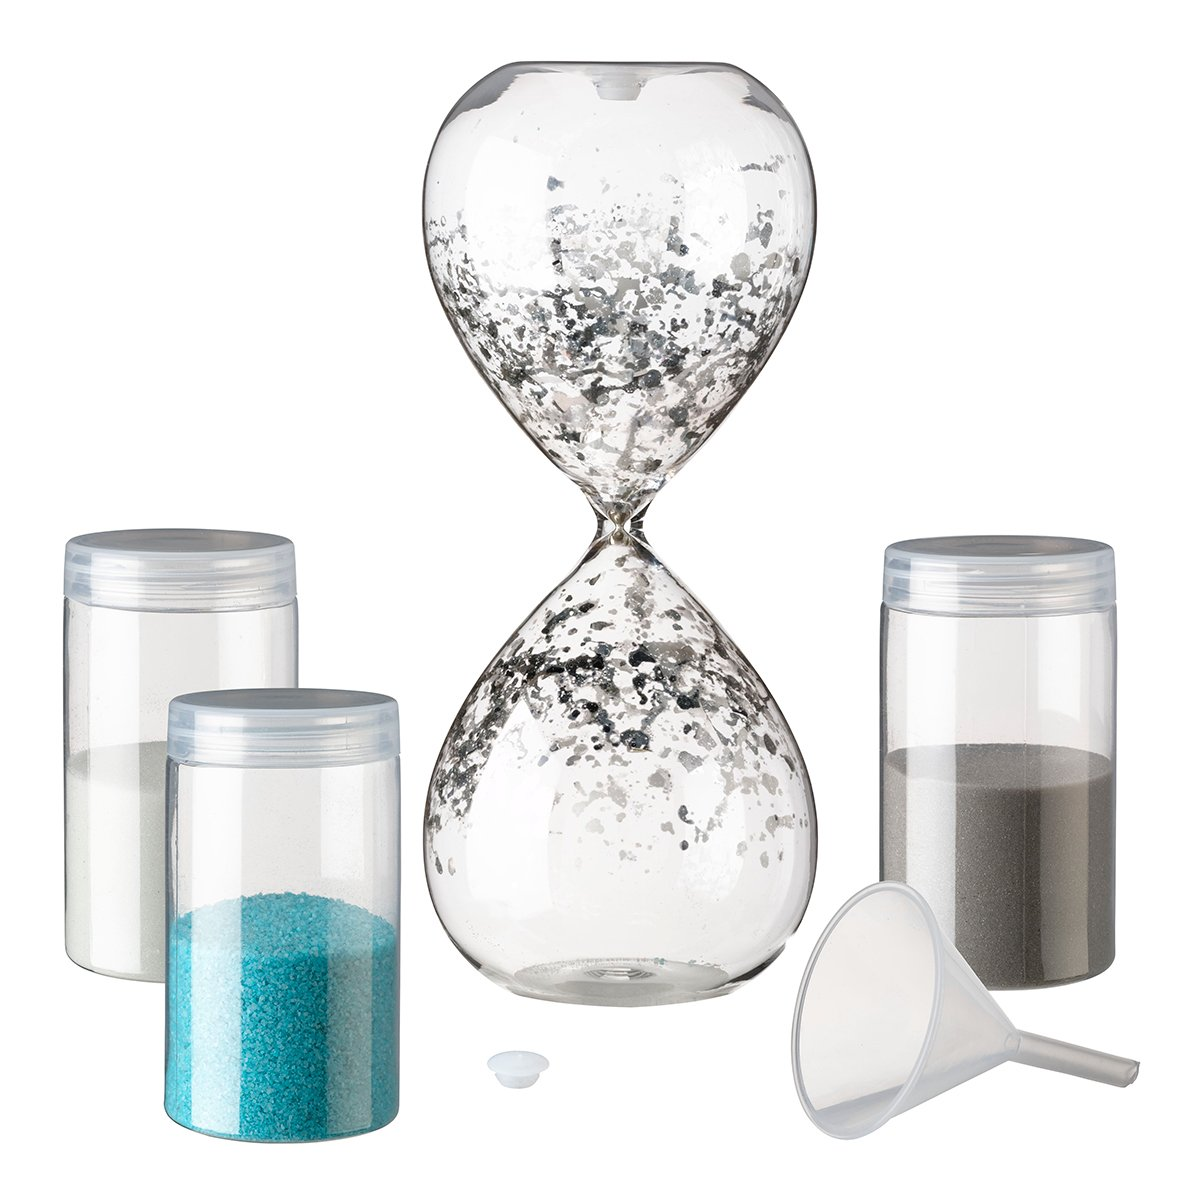 Lillian Rose us120 Einheit Sand Stunde Glas, 21 x 8,3 cm klar ...